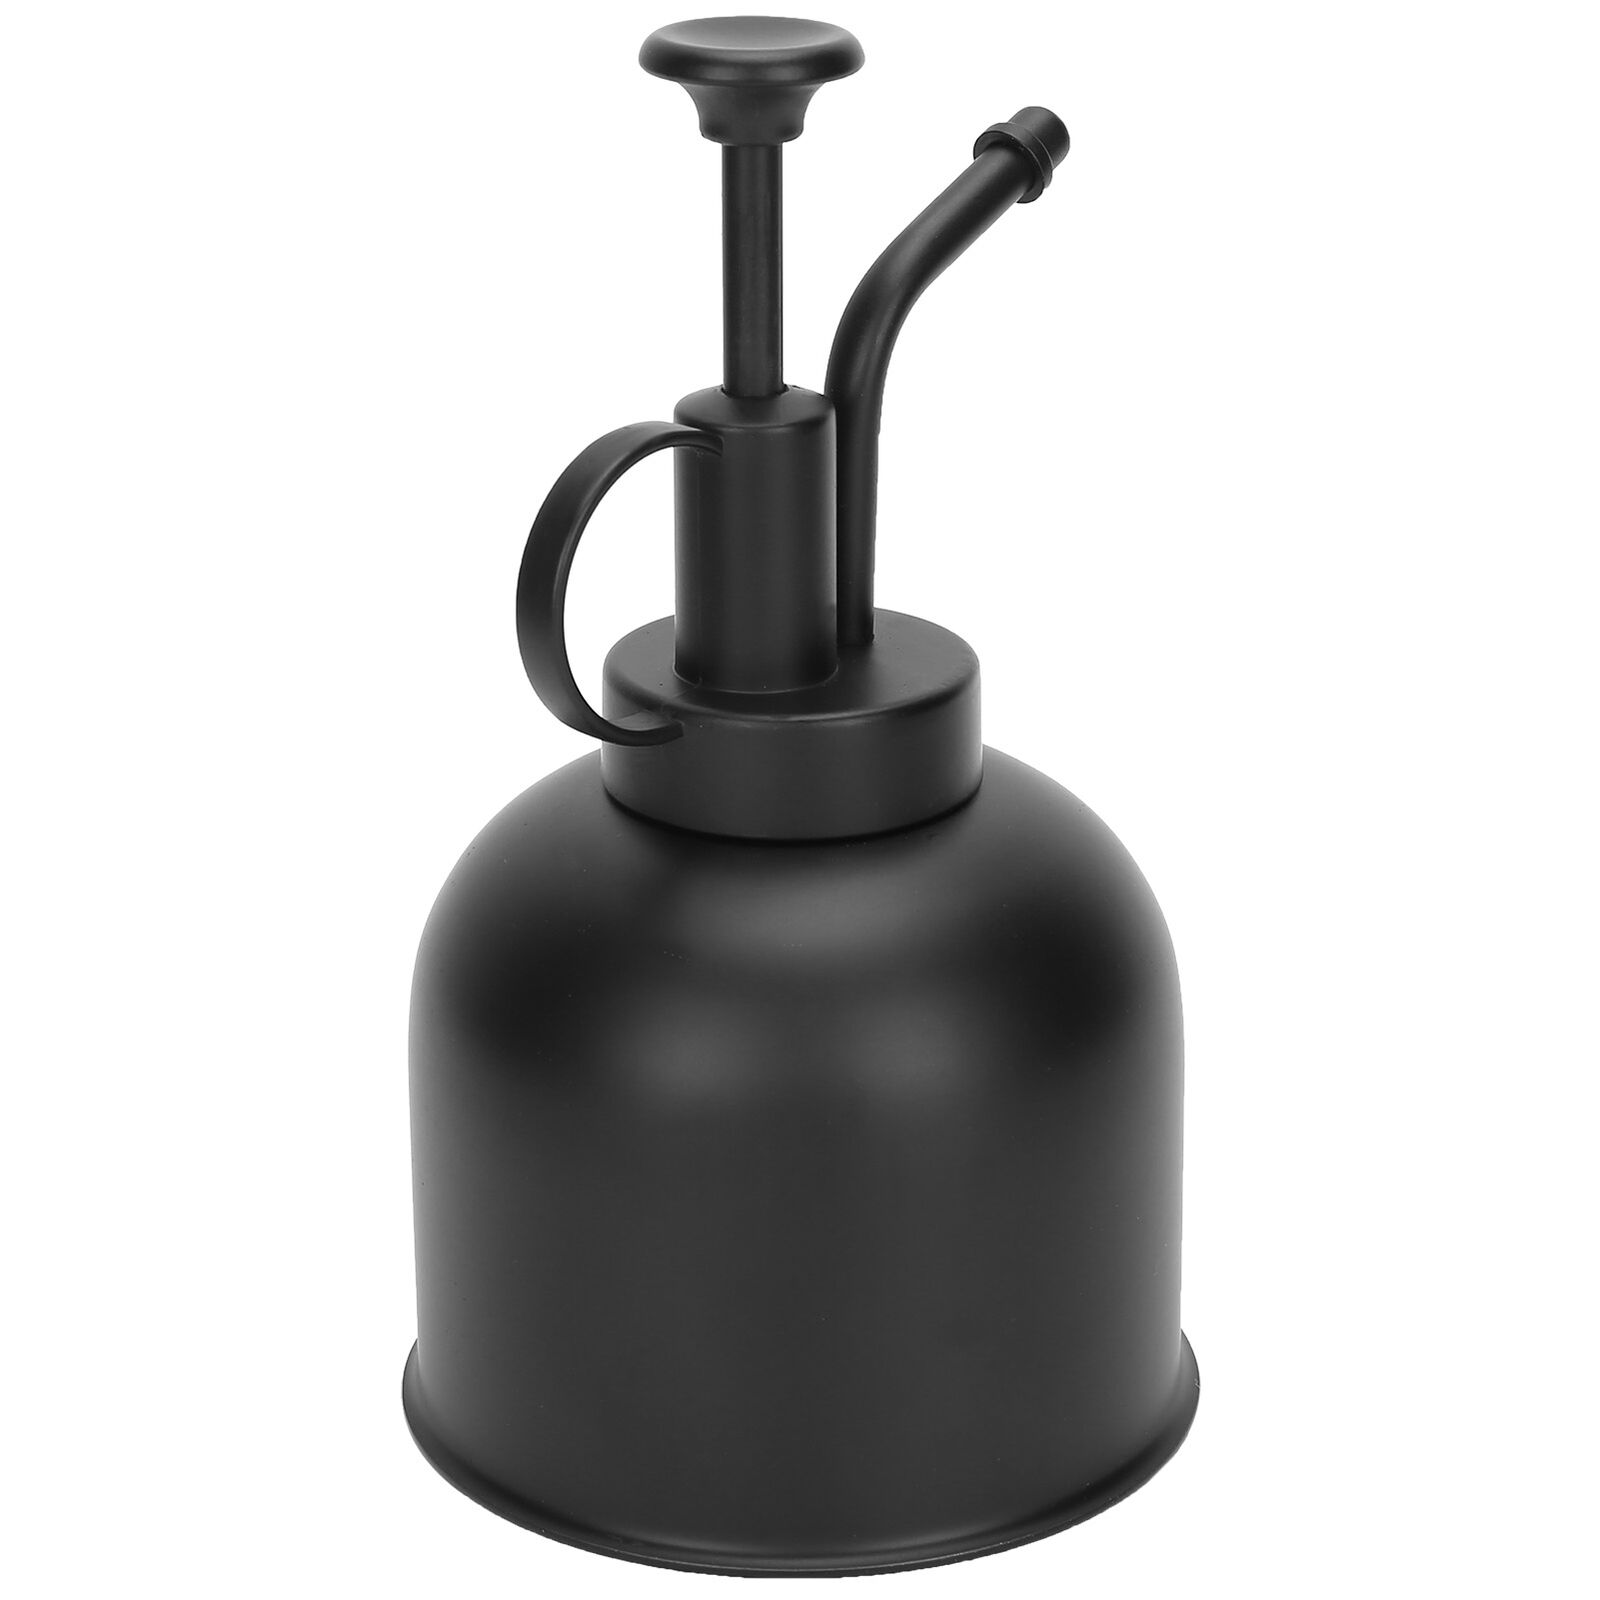 Black 300ml Plant Indoor Watering Can House Water Spray Sprayer Bottle